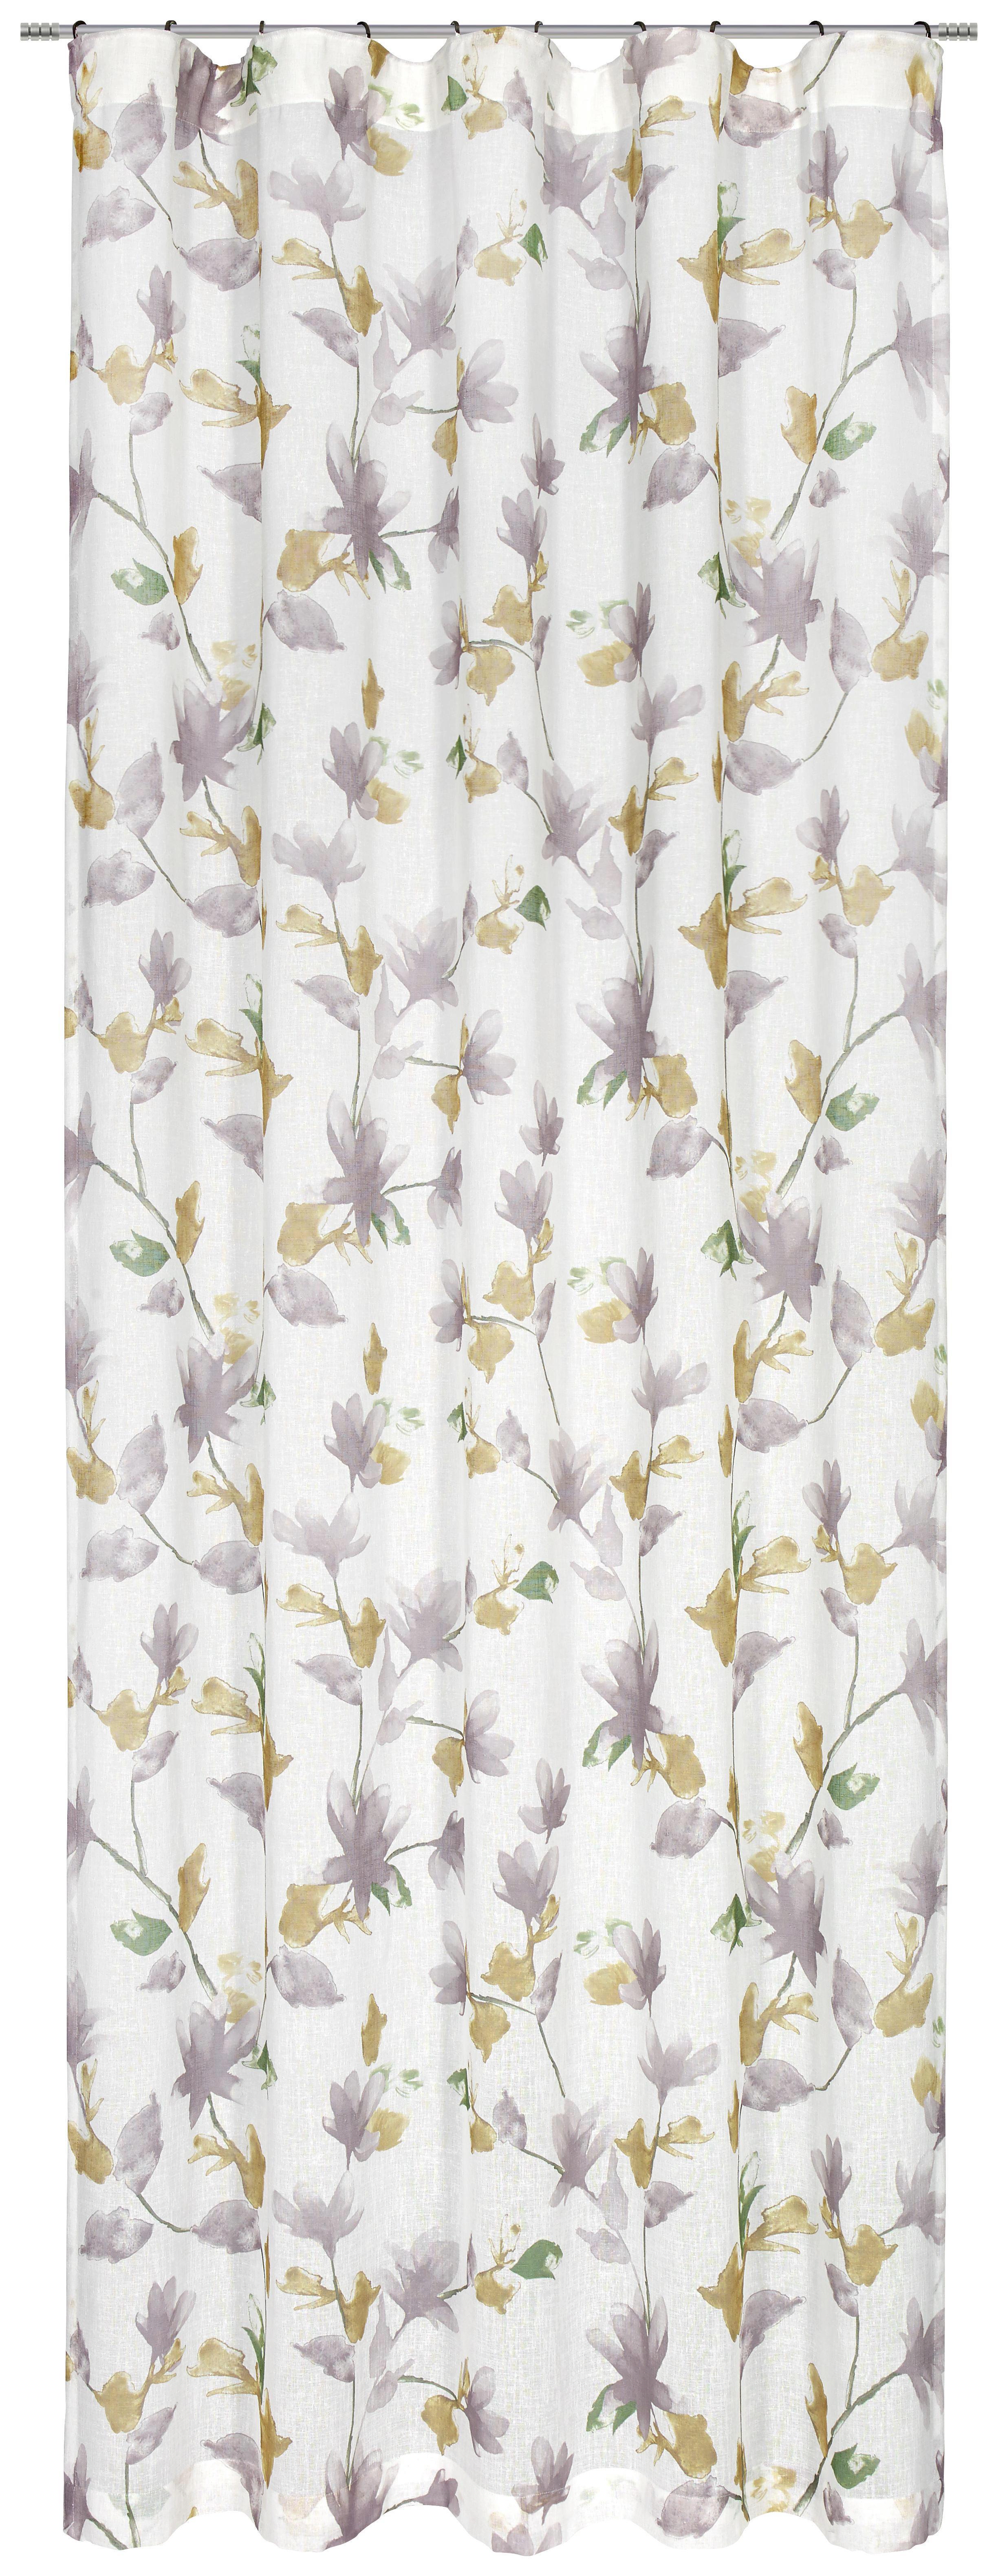 FERTIGVORHANG halbtransparent - Taupe/Grün, MODERN, Textil (135/245cm) - ESPOSA